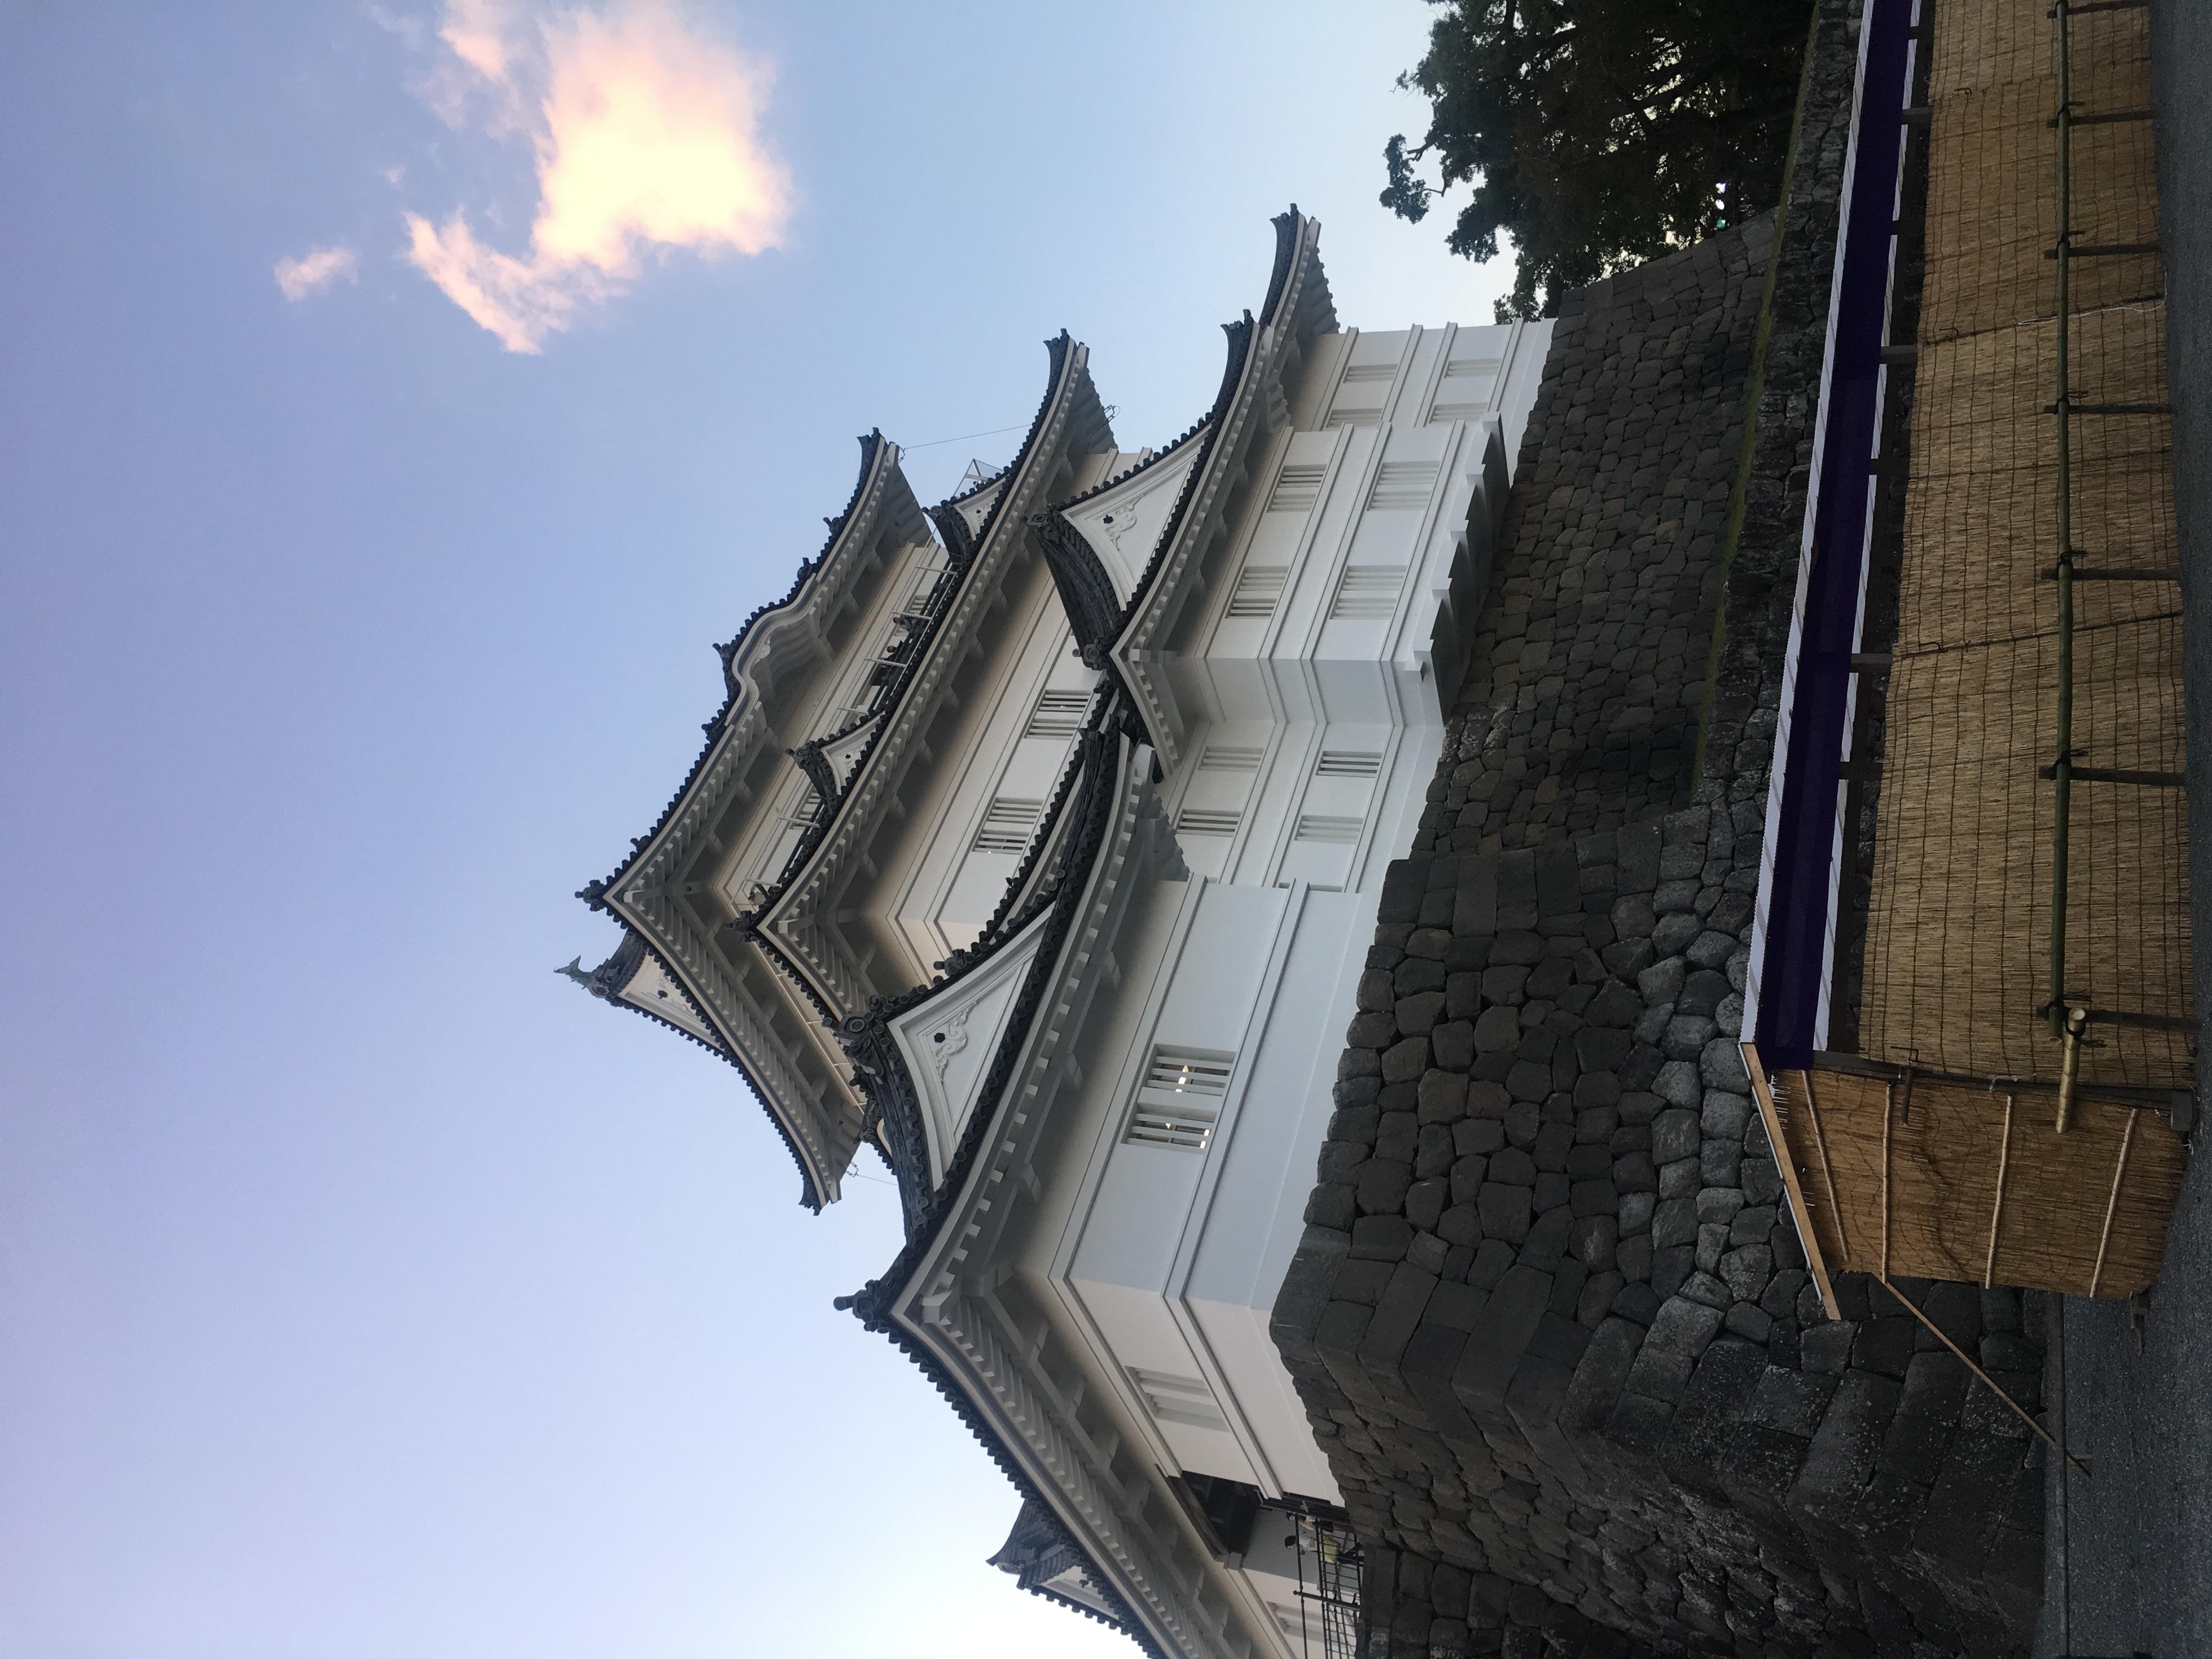 Lab Trip to Hakone 箱根へ研究室旅行